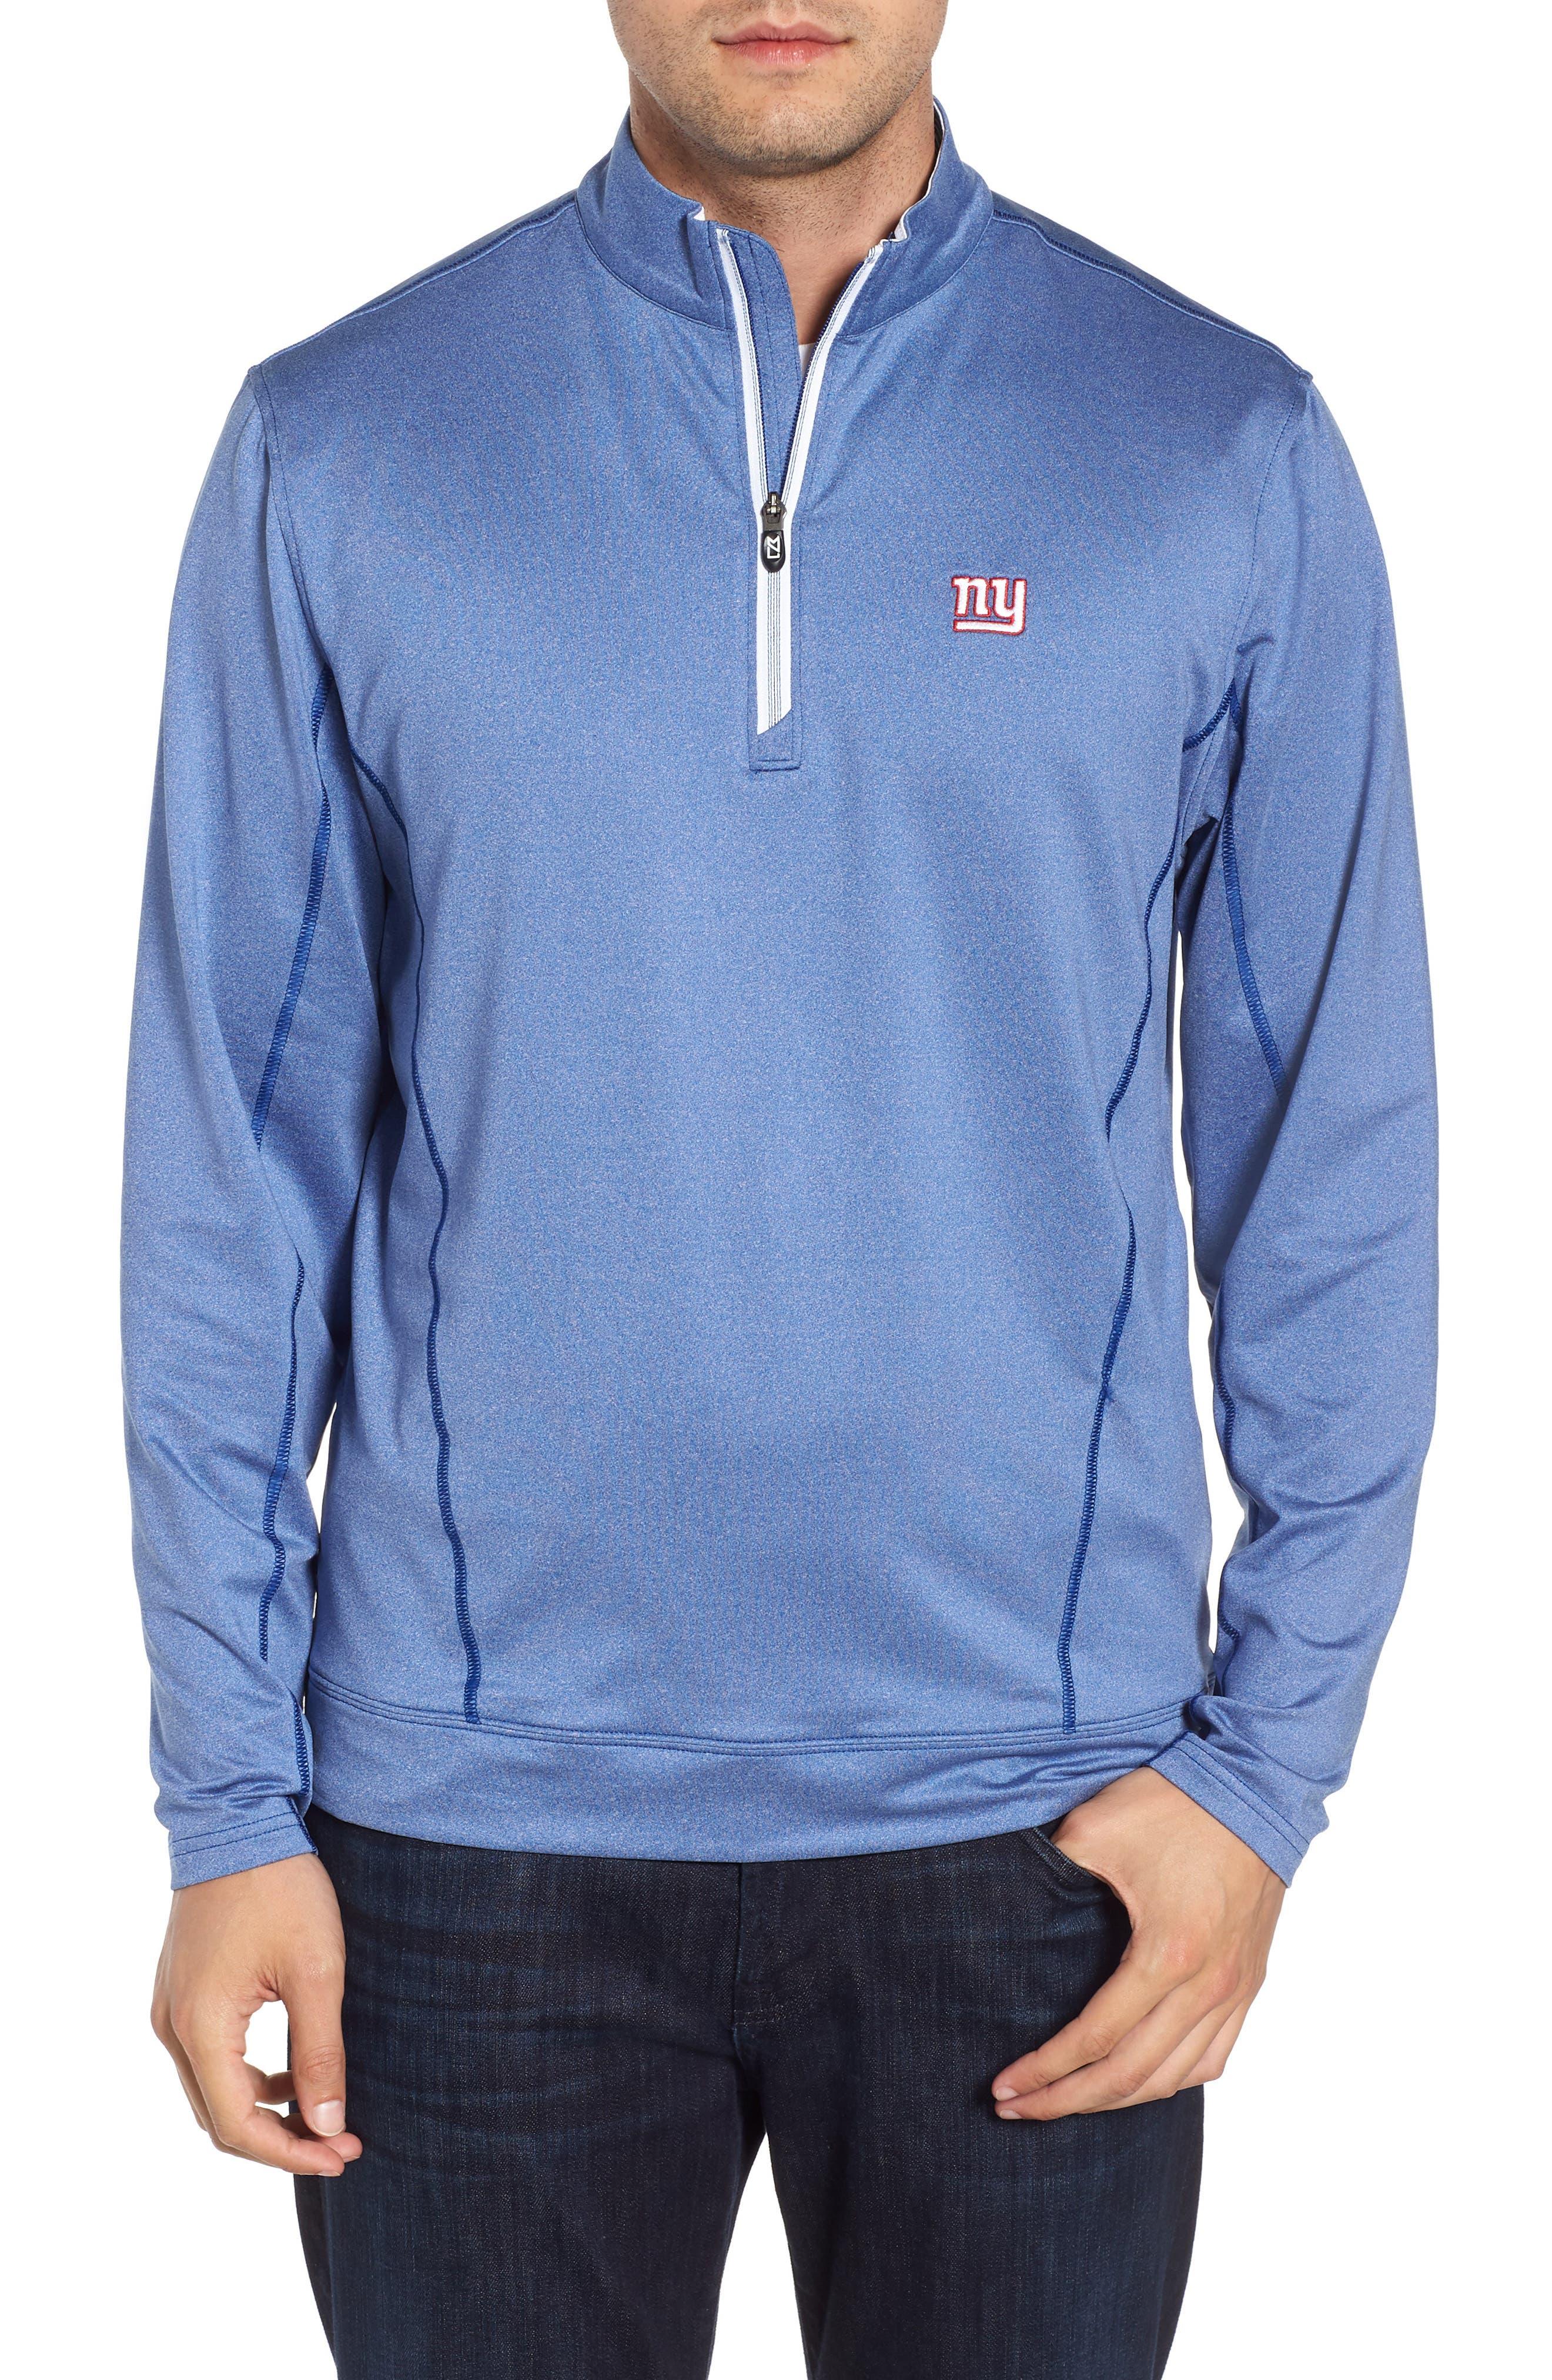 Endurance New York Giants Regular Fit Pullover,                         Main,                         color, TOUR BLUE HEATHER